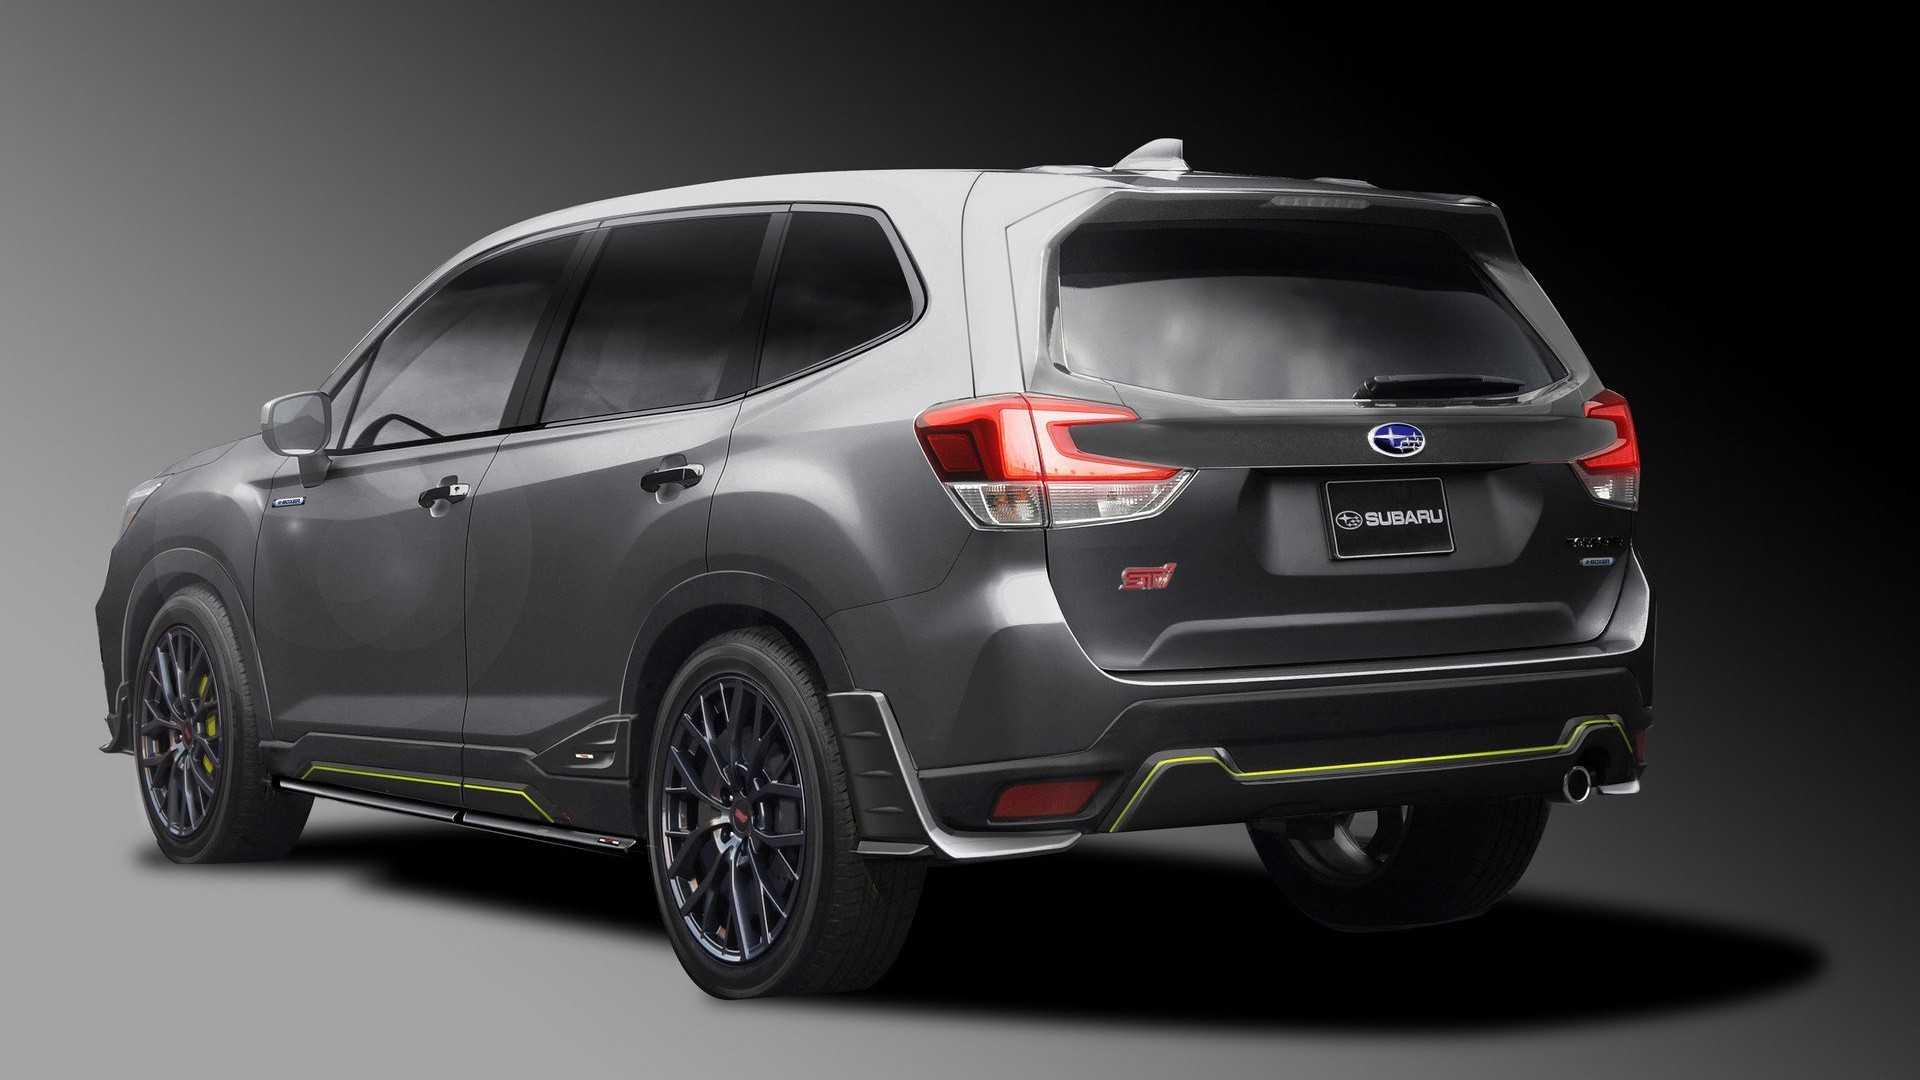 Subaru Impreza STI and Forester STI concepts tease 2019